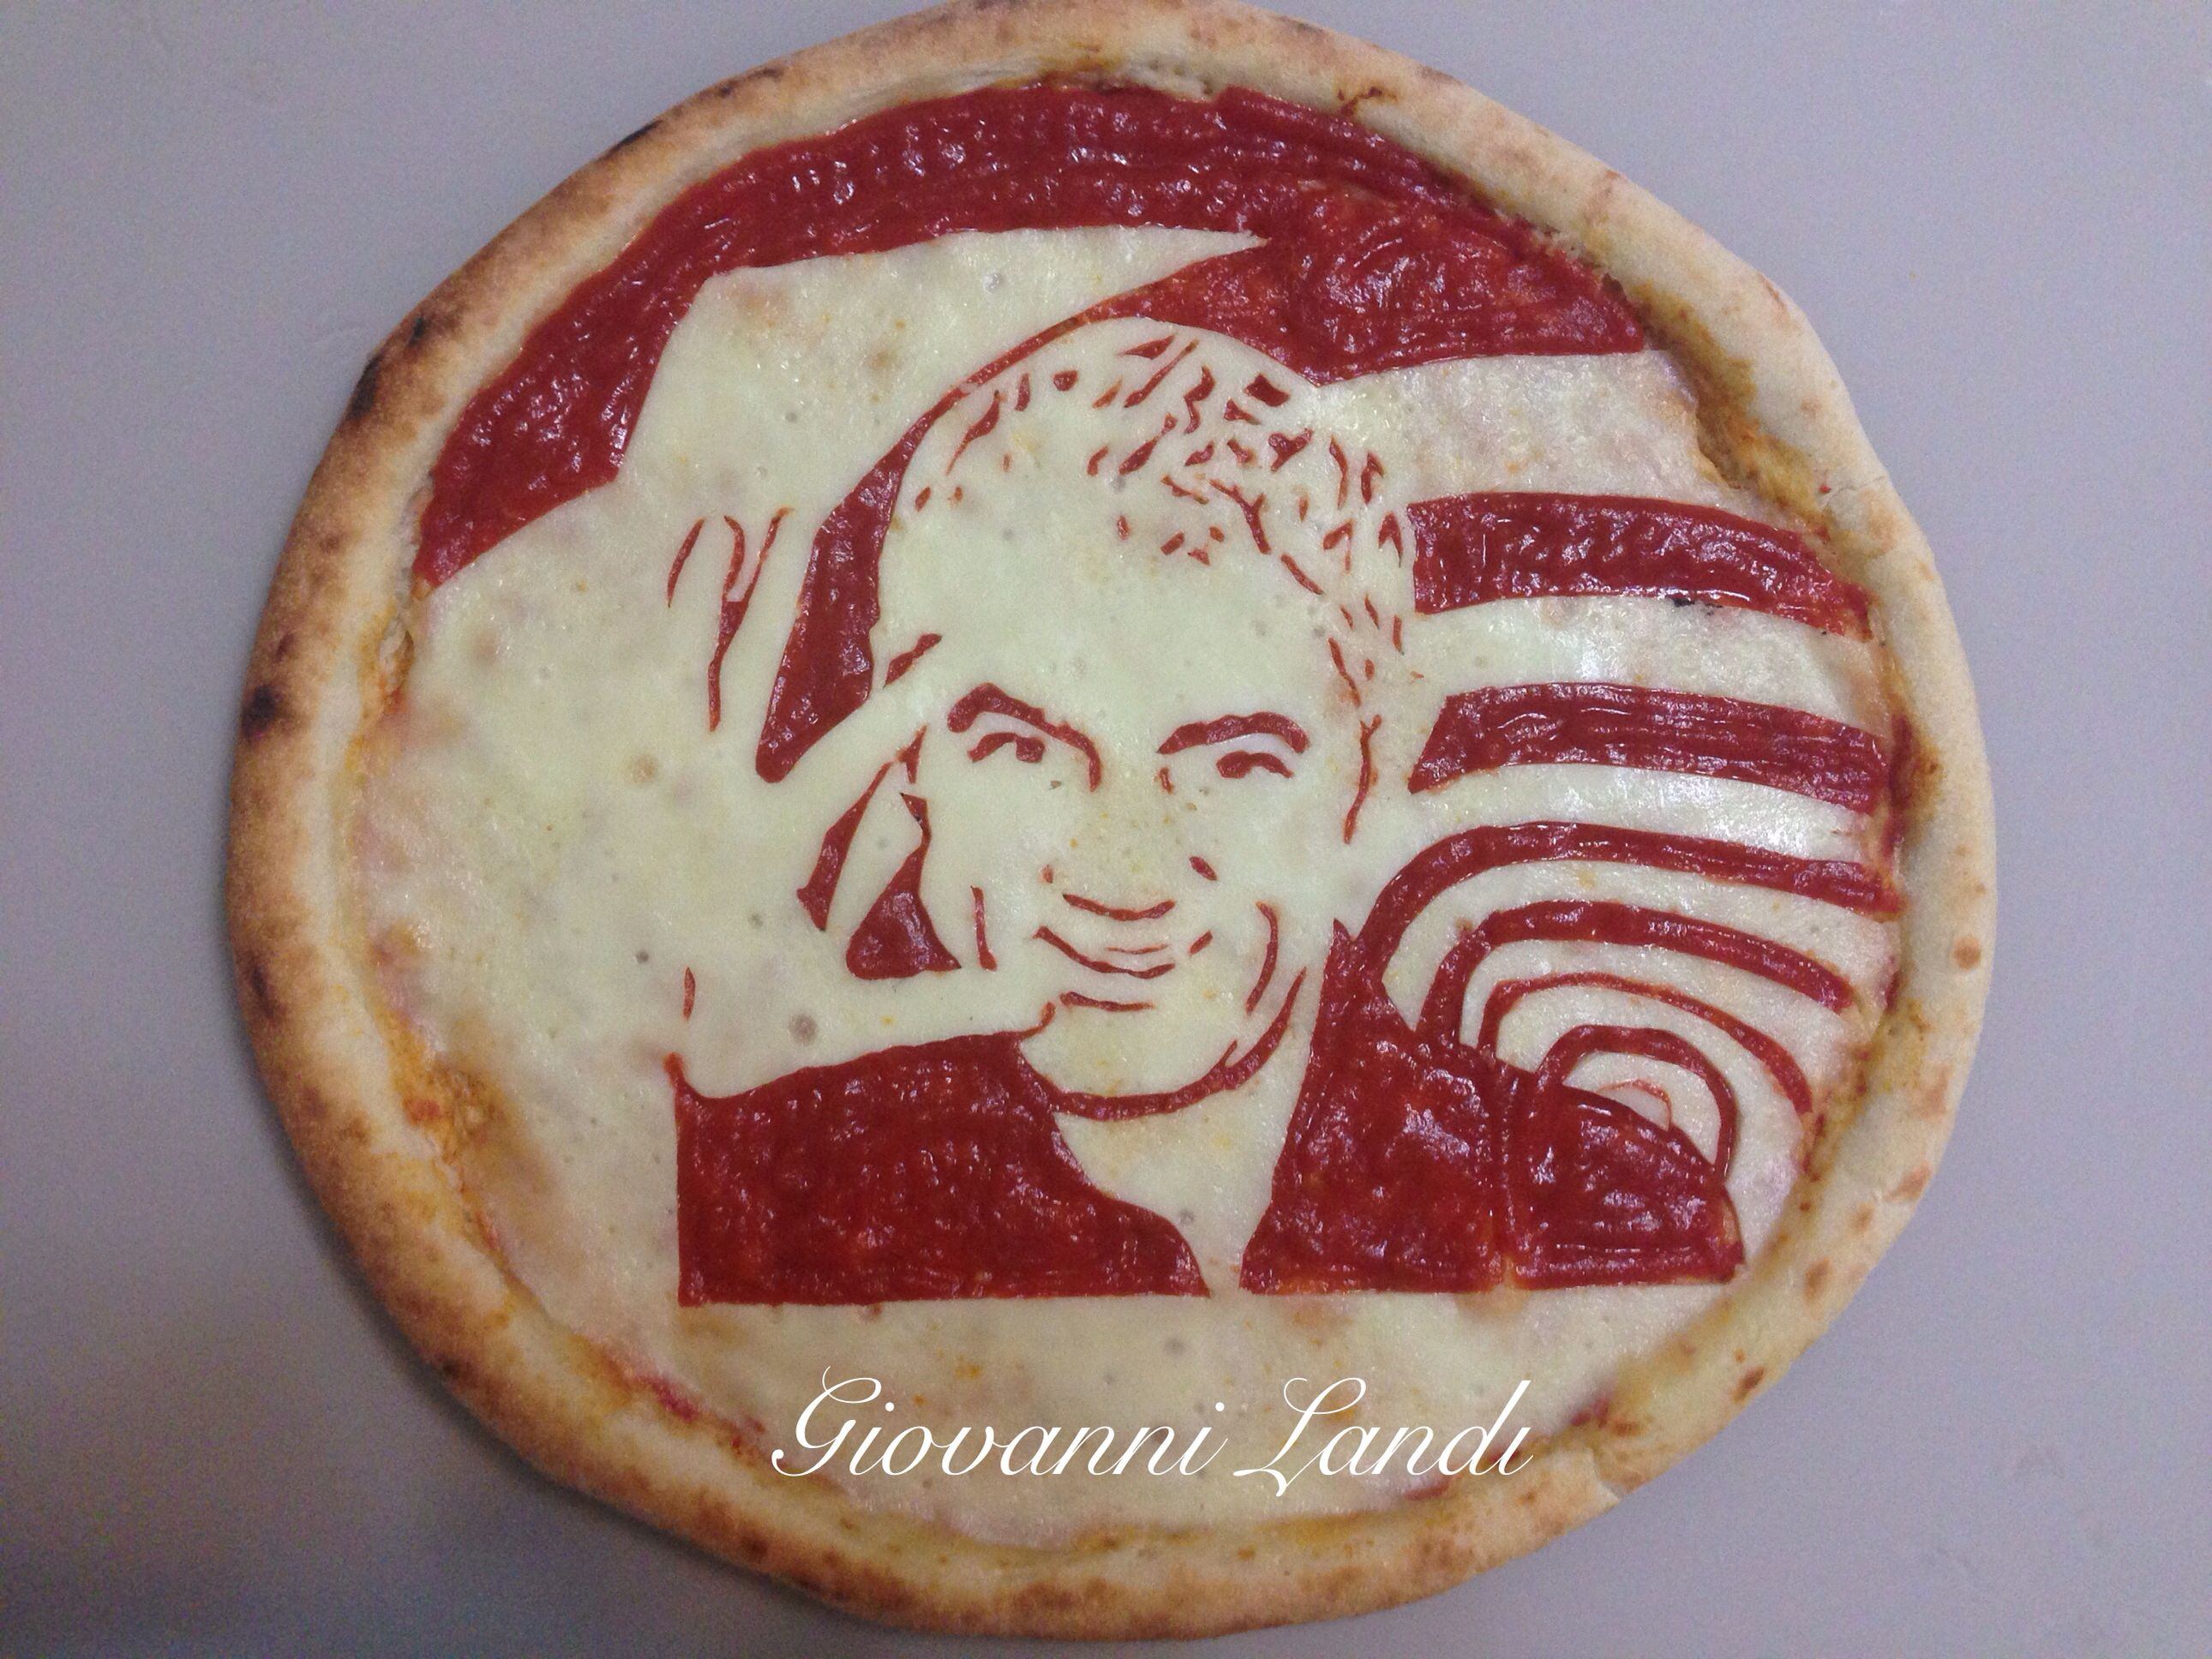 Giovanni Landi PizzArte pizza Biagio Izzo | Food art, Food ...